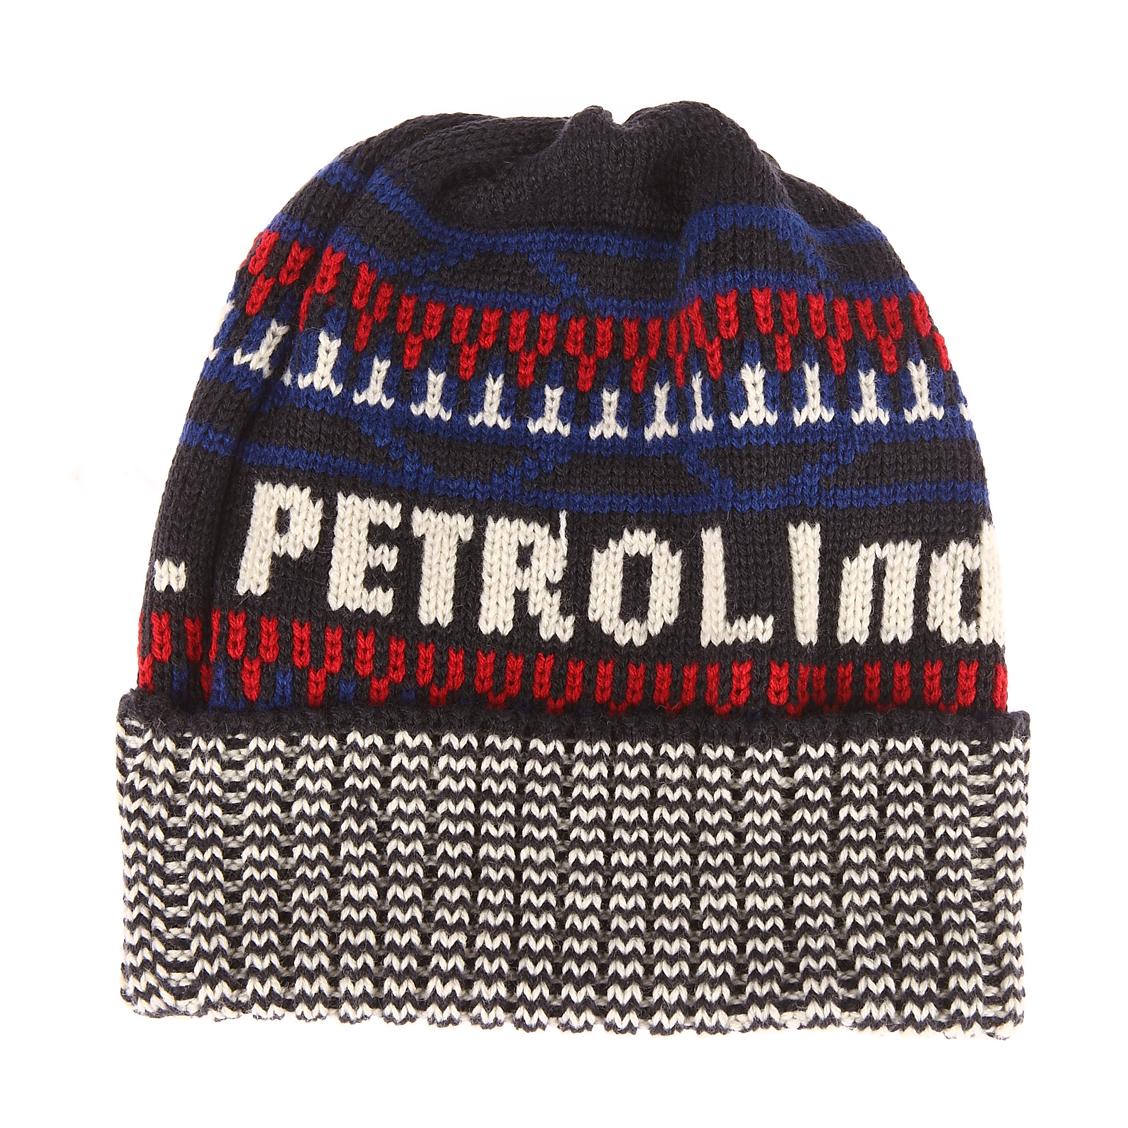 Bonnet Petrol Industries bleu marine brodé en rouge, blanc et bleu